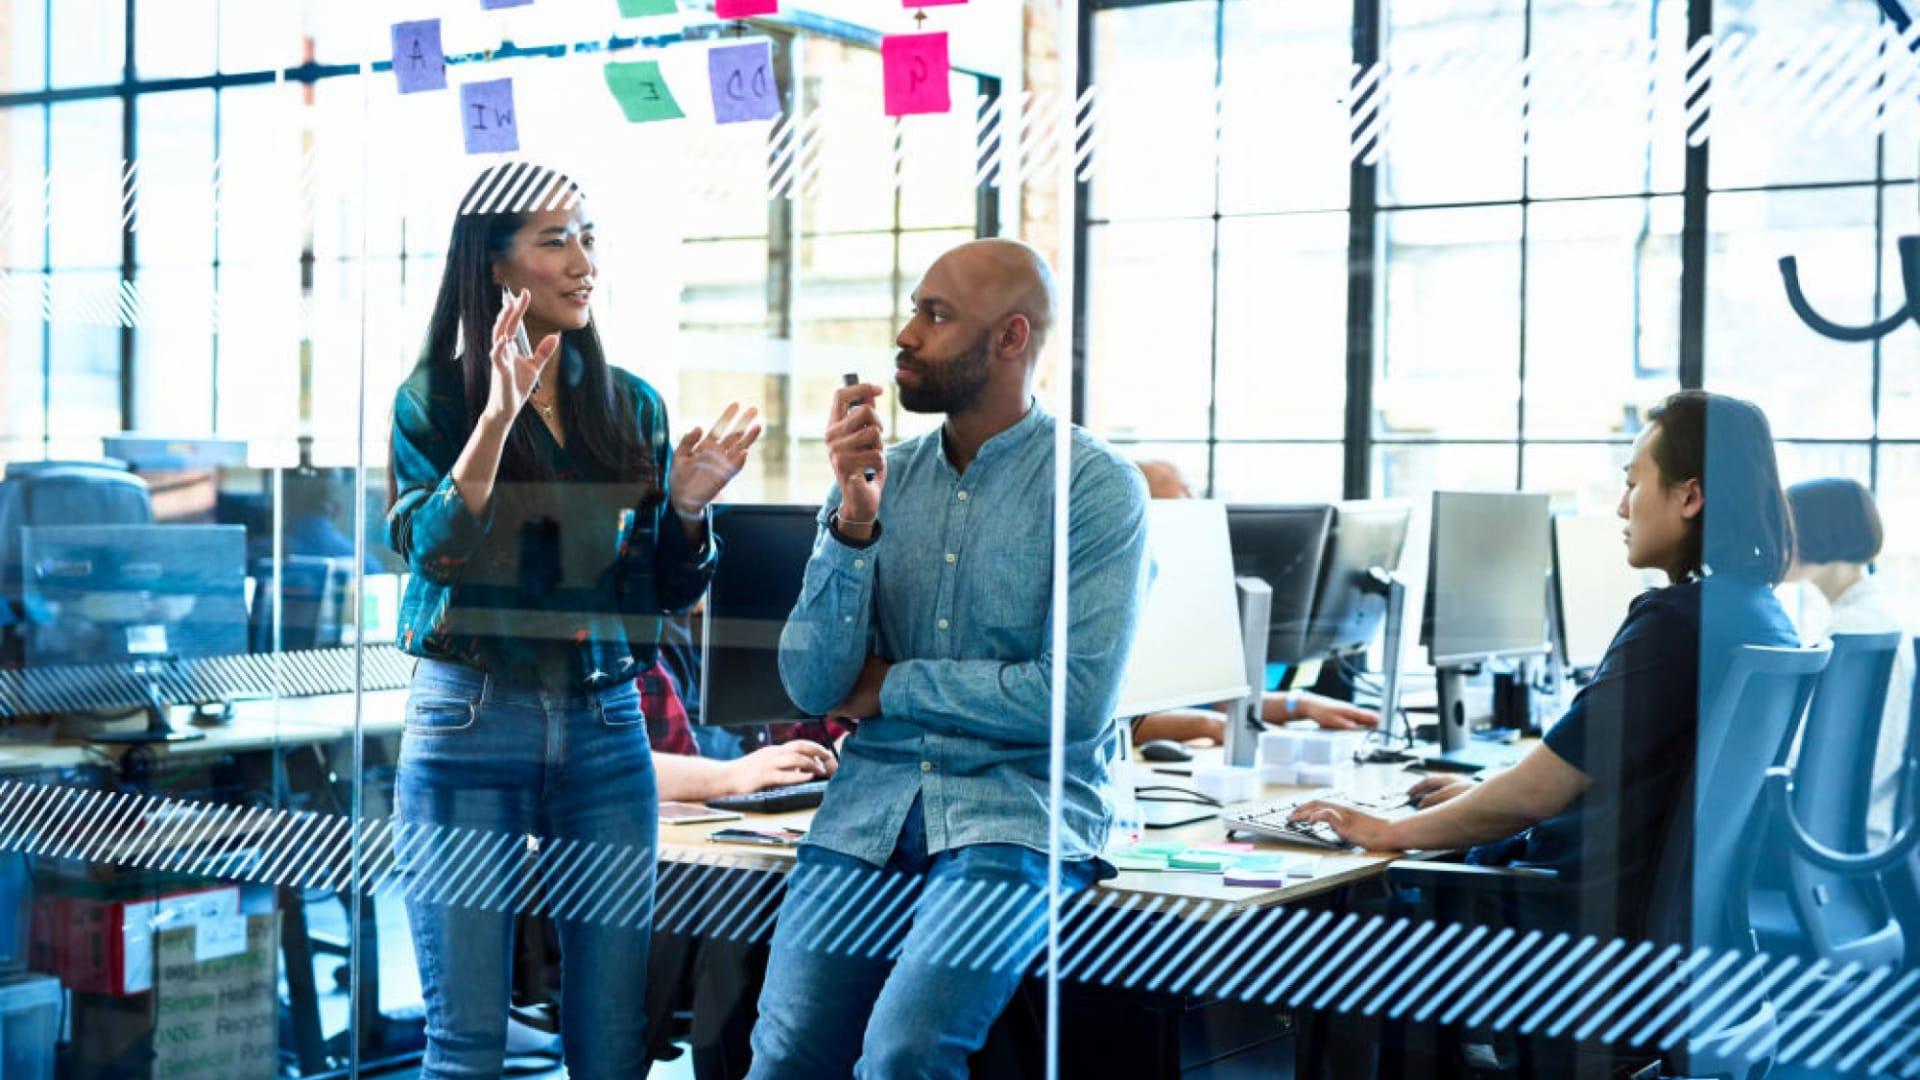 3 Ways to Use Adversity to Drive Innovation